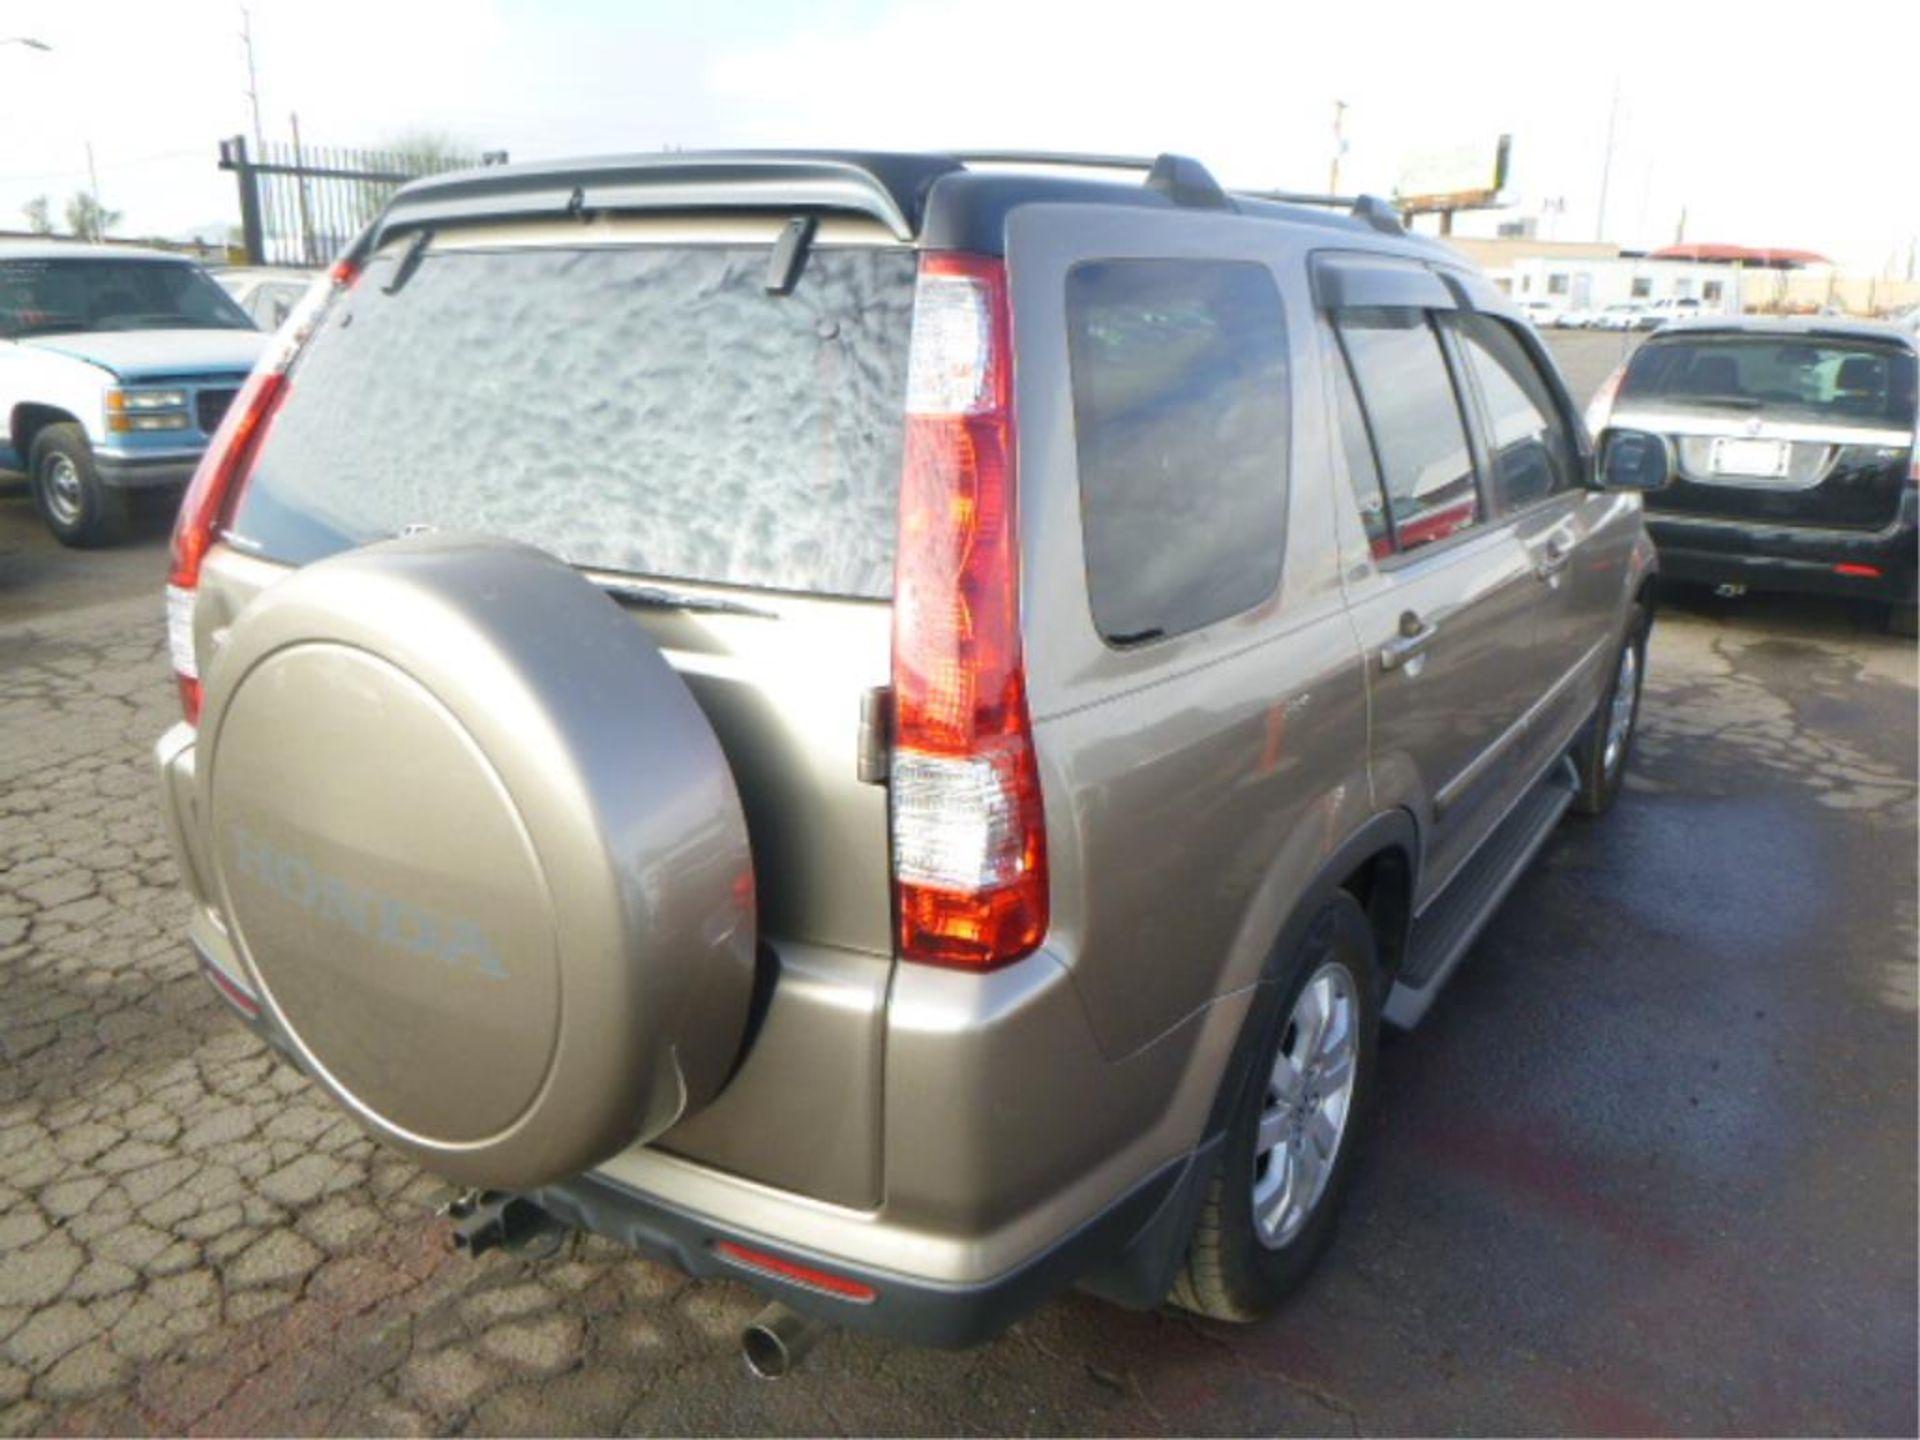 2005 Honda CR-V - Image 4 of 14